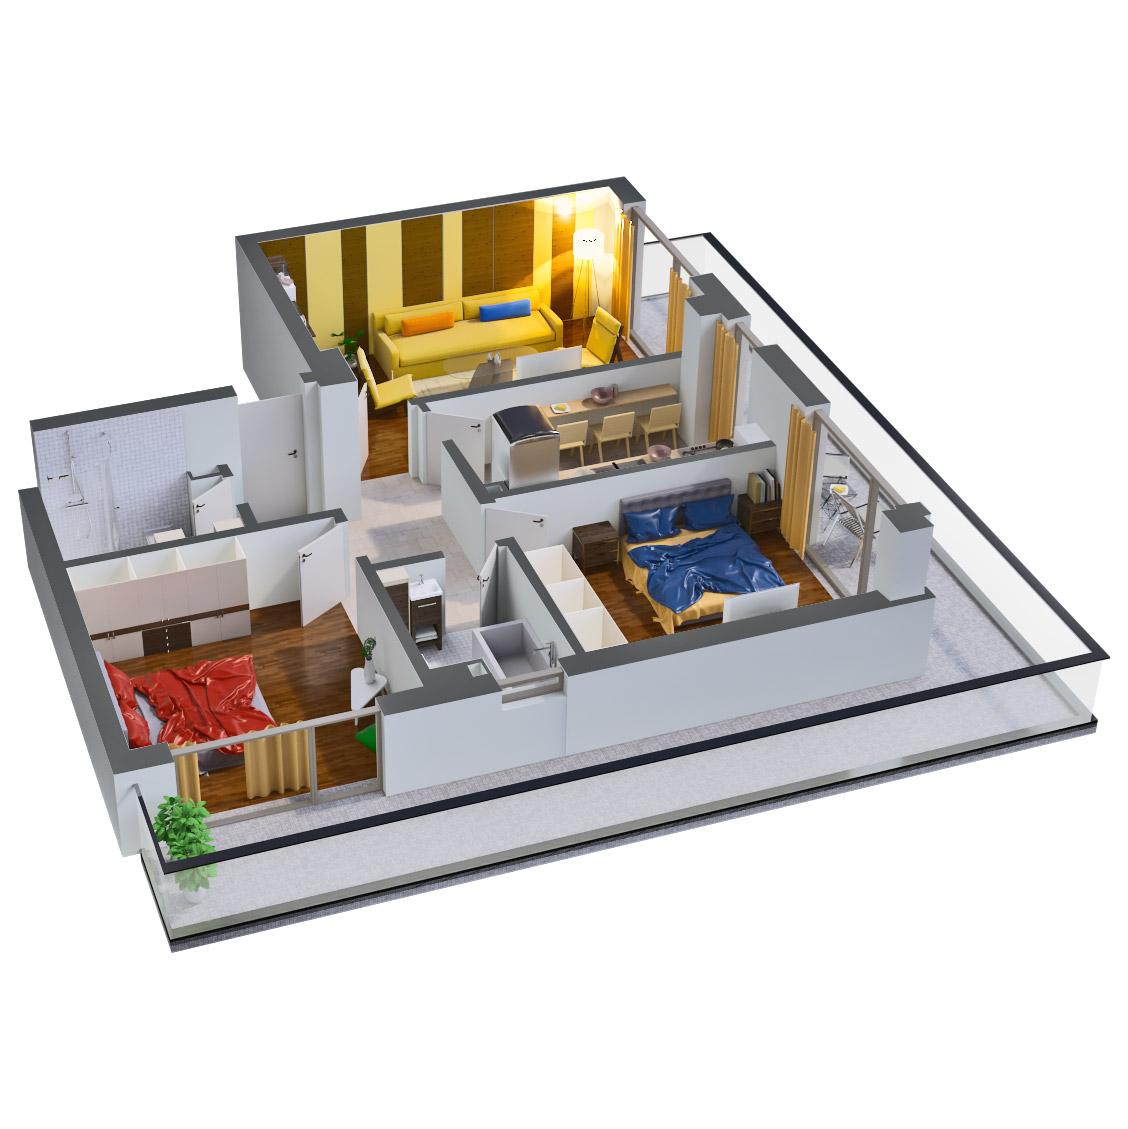 Apartament 3 camere de vanzare Bucuresti - Catedral Residence - Marriott, Piata Unirii, 13 Septembrie, Izvor - Tip 6 - T2 - B